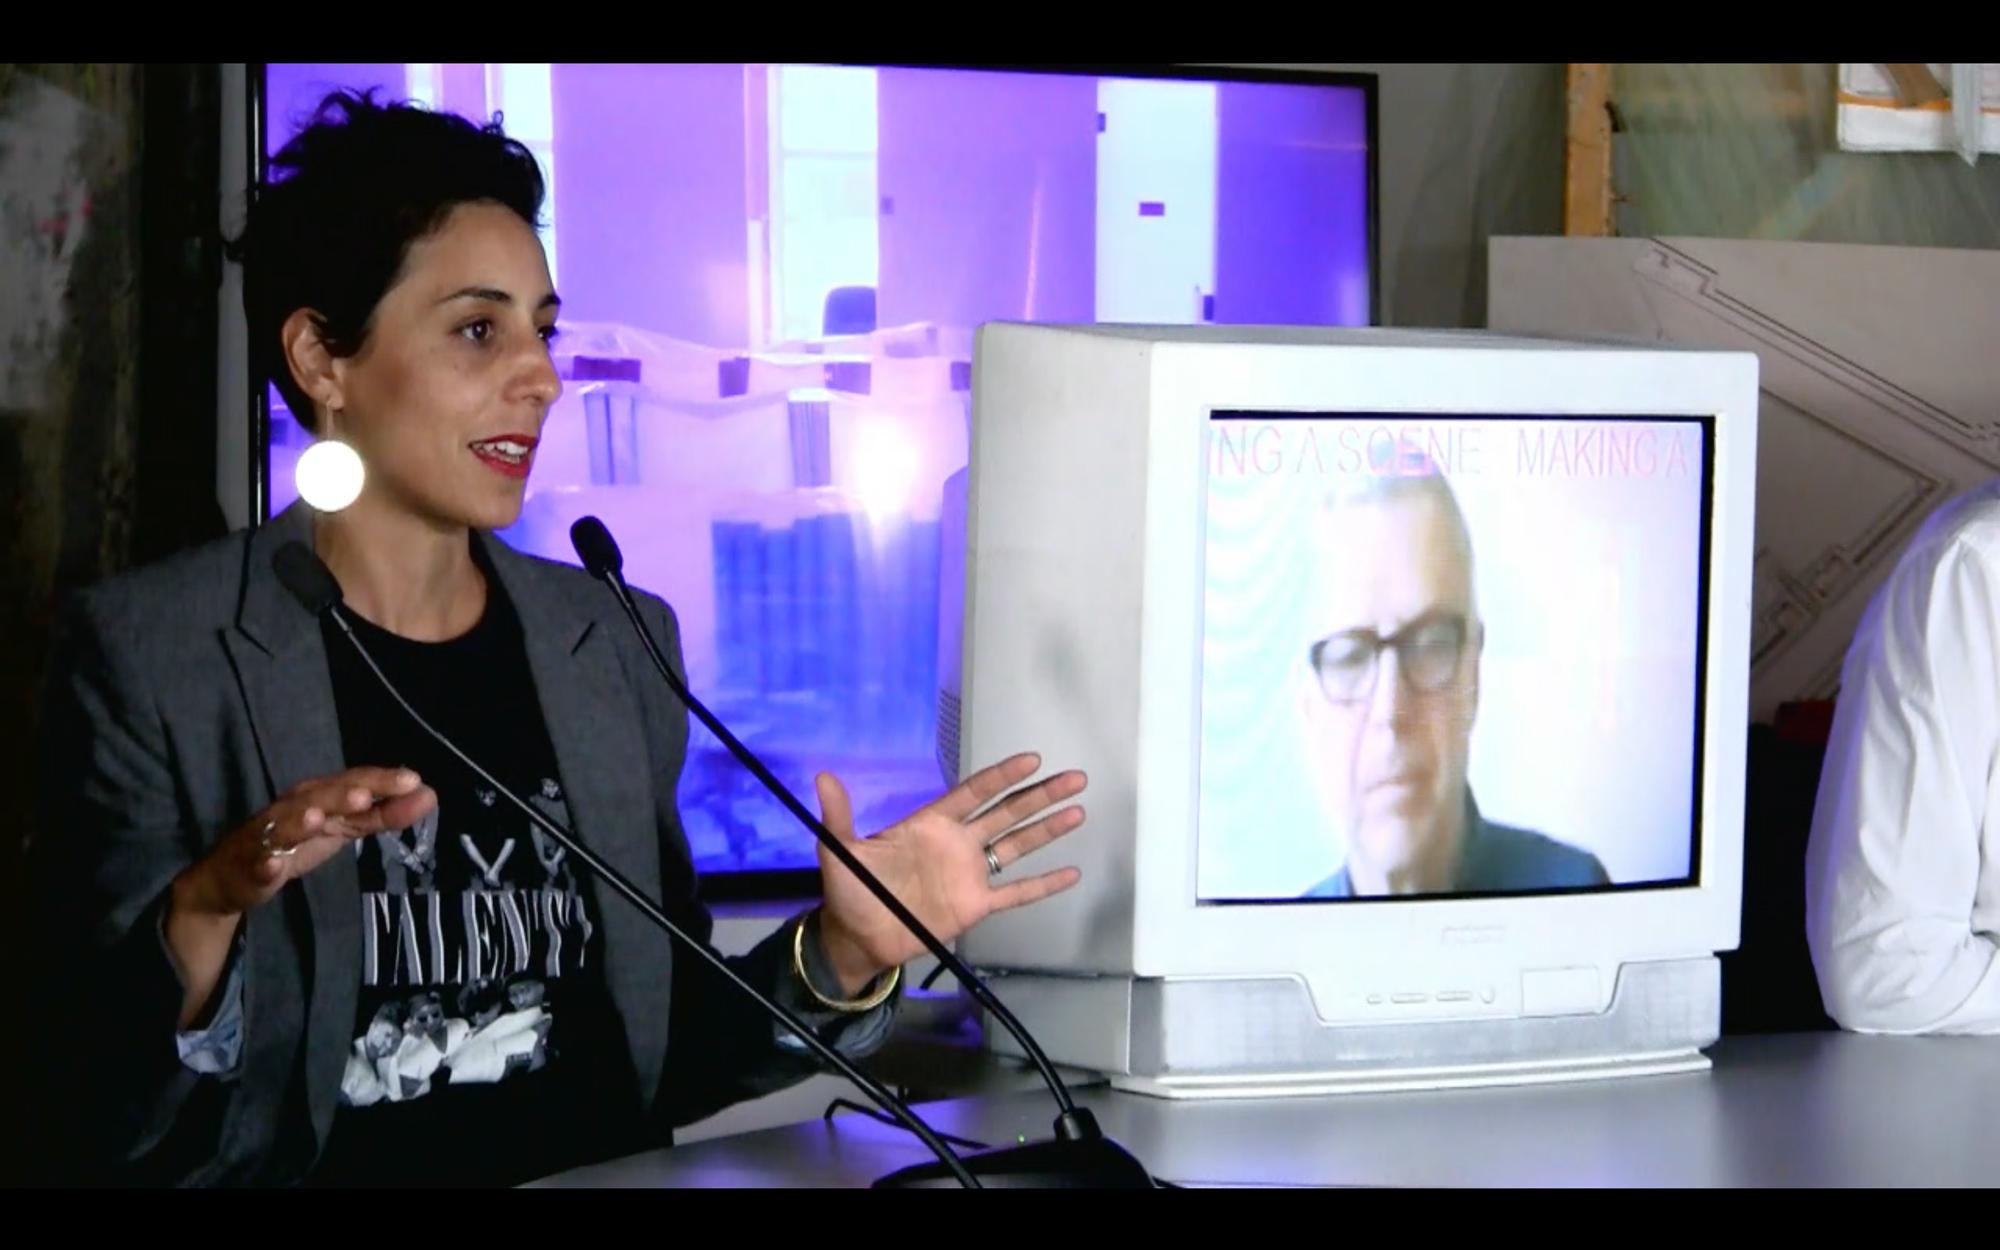 woman speaking man on tv screen